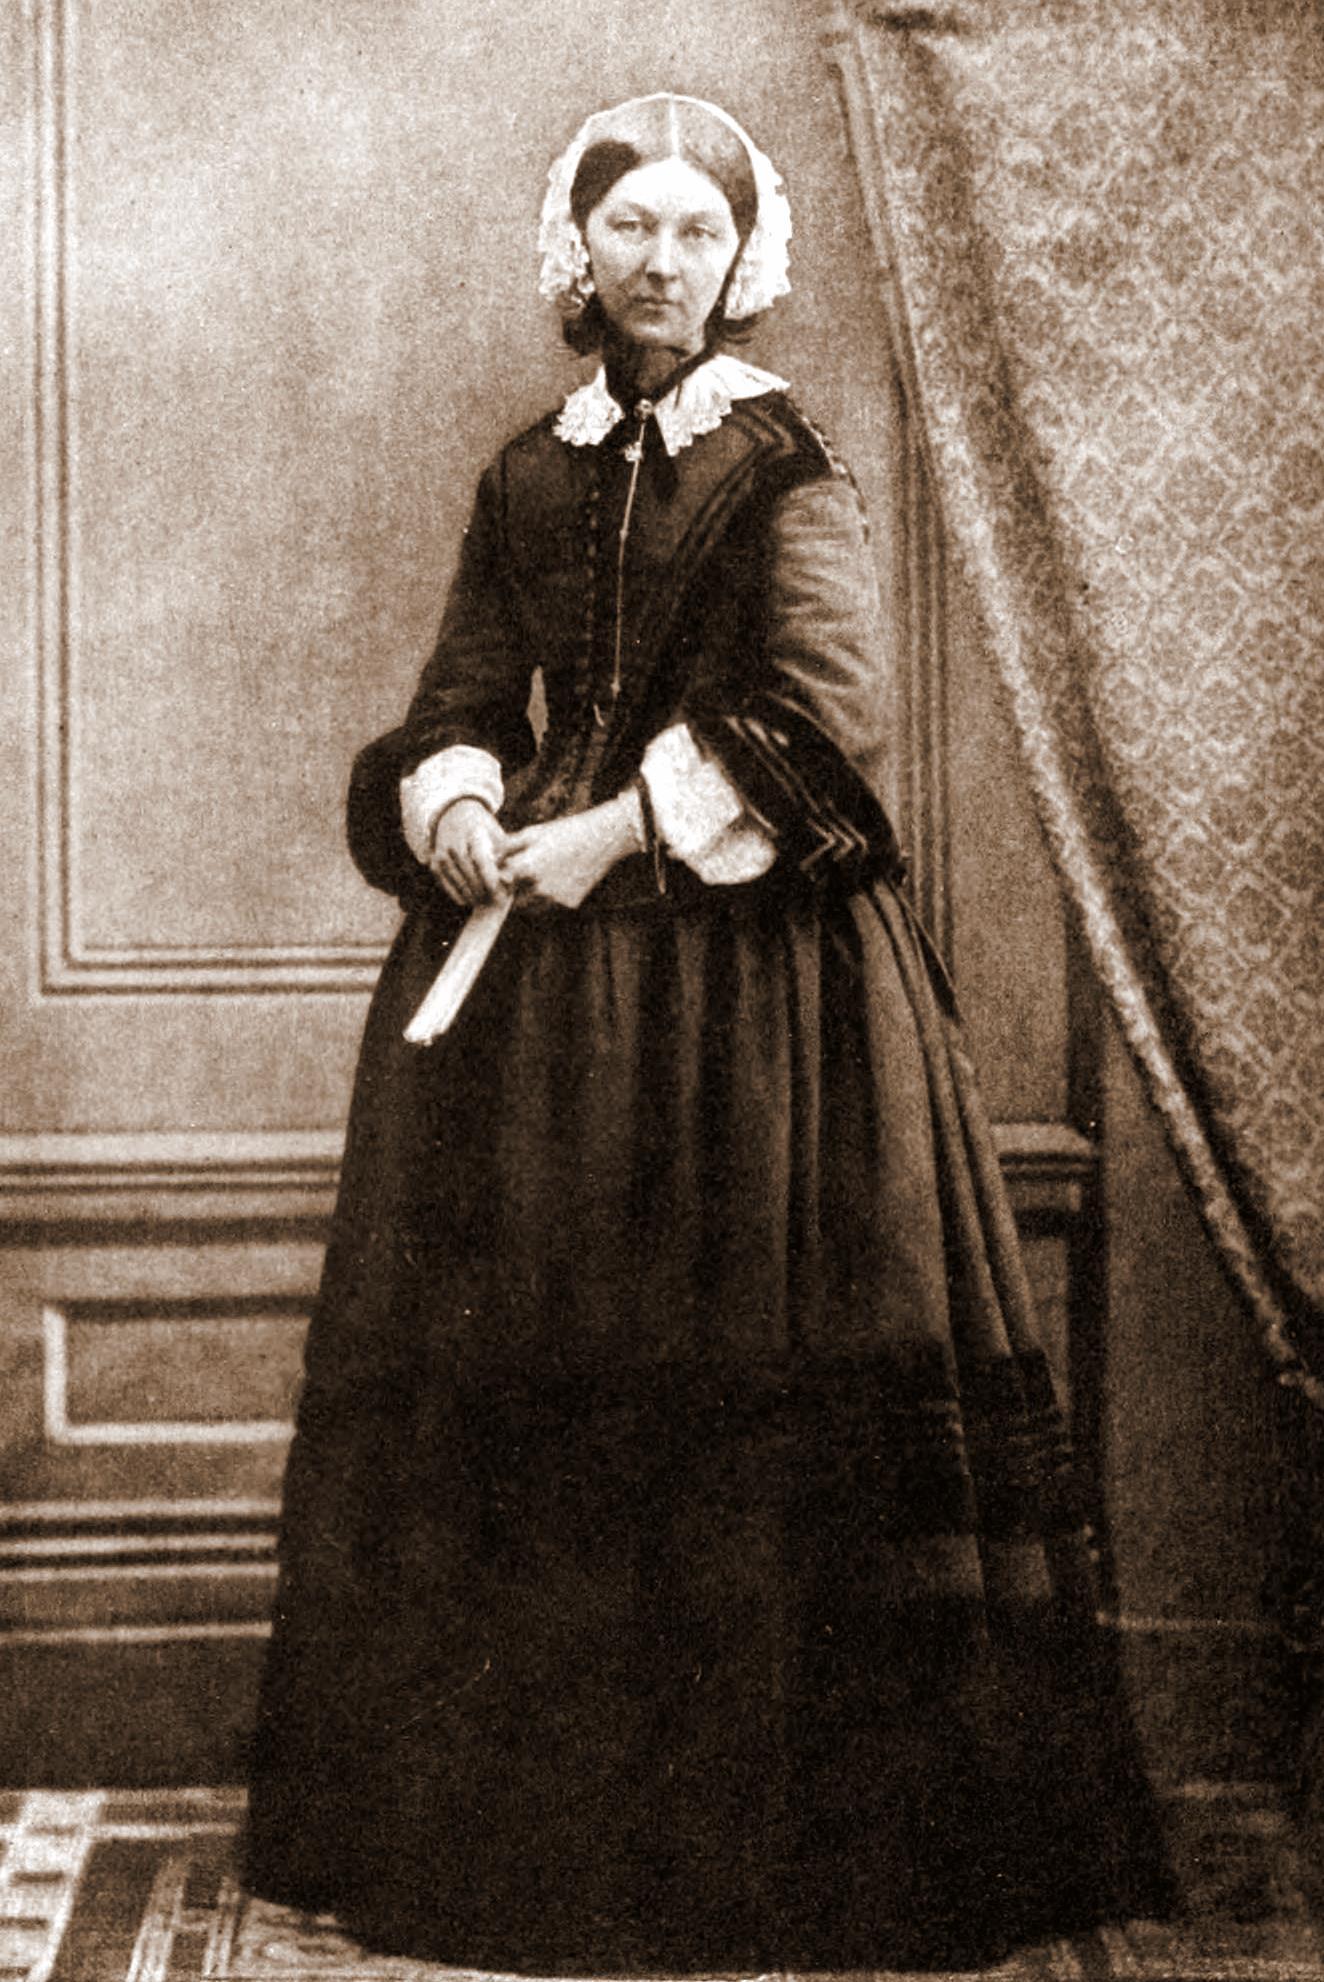 Florence Nightingale by Goodman, circa 1858. Published in The Life of Florence Nightingale by Edward Cook, 1913.